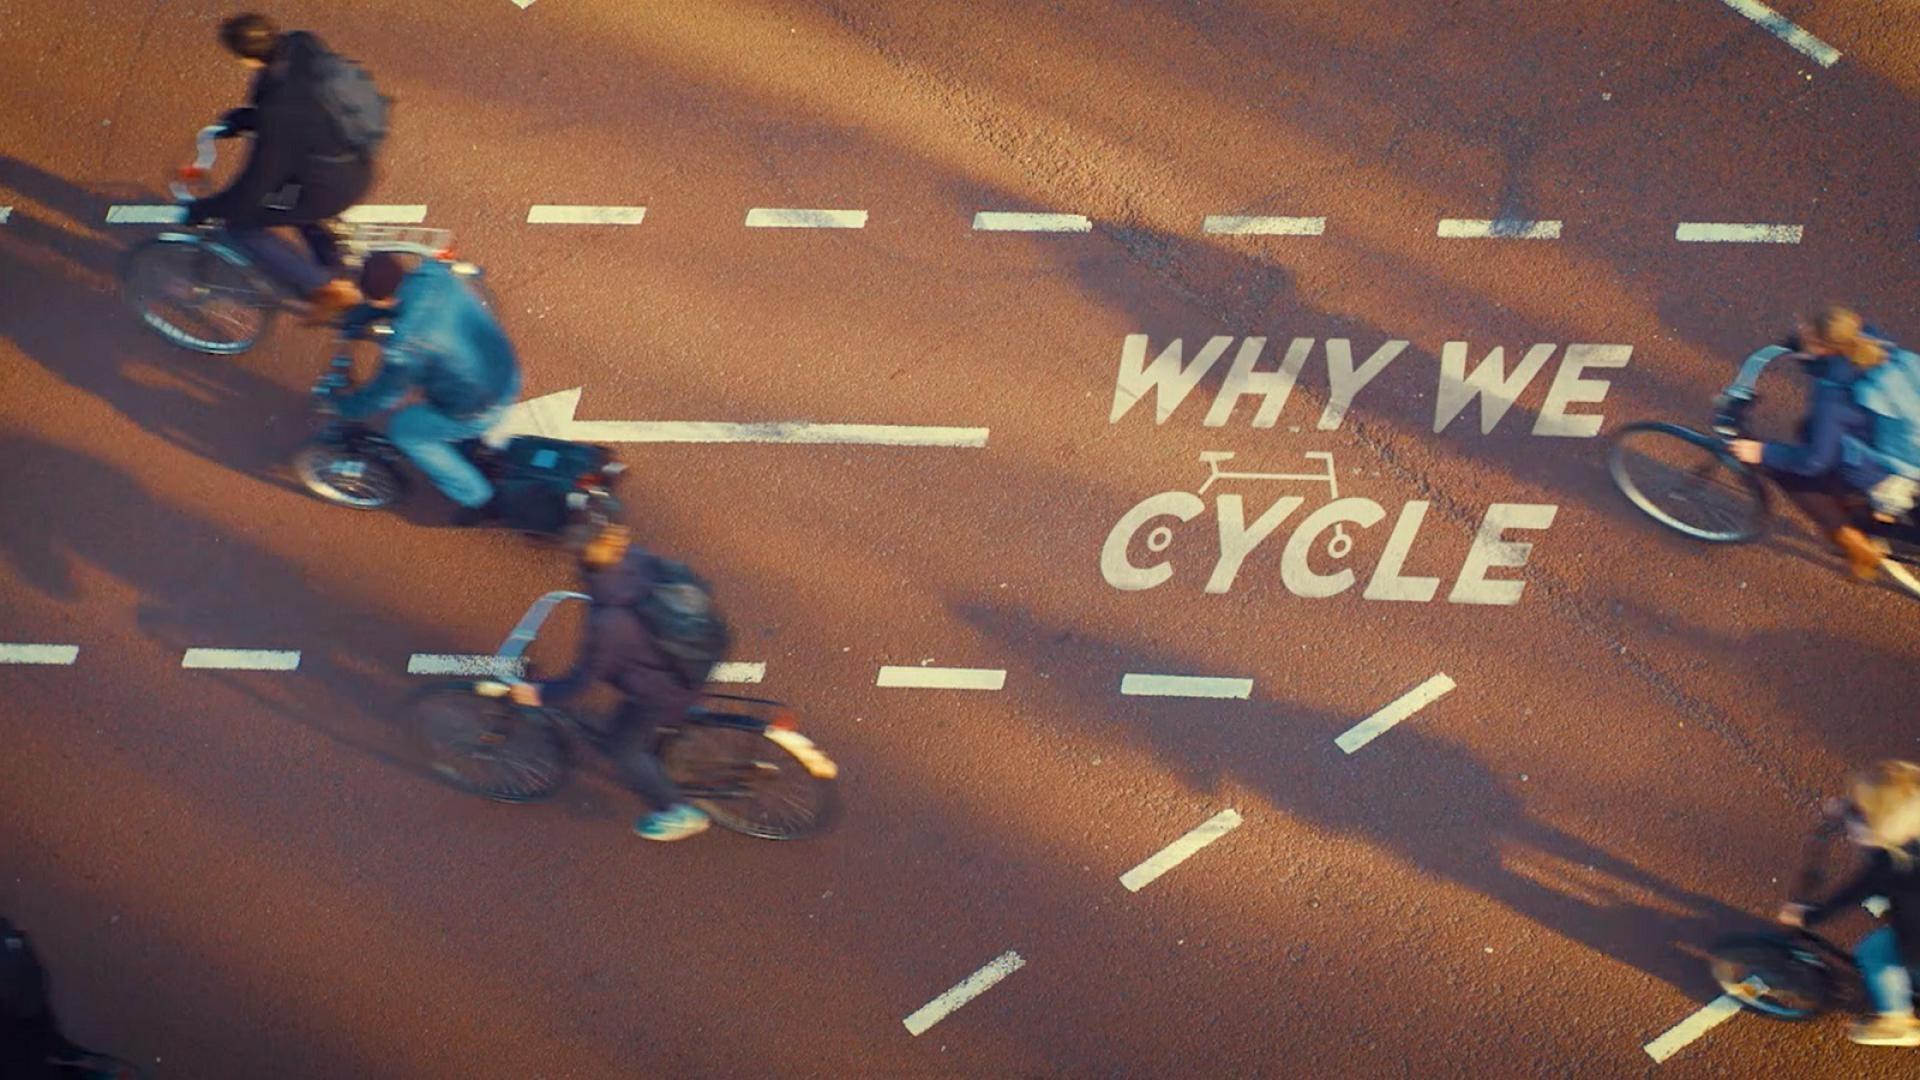 whywecycle.jpg